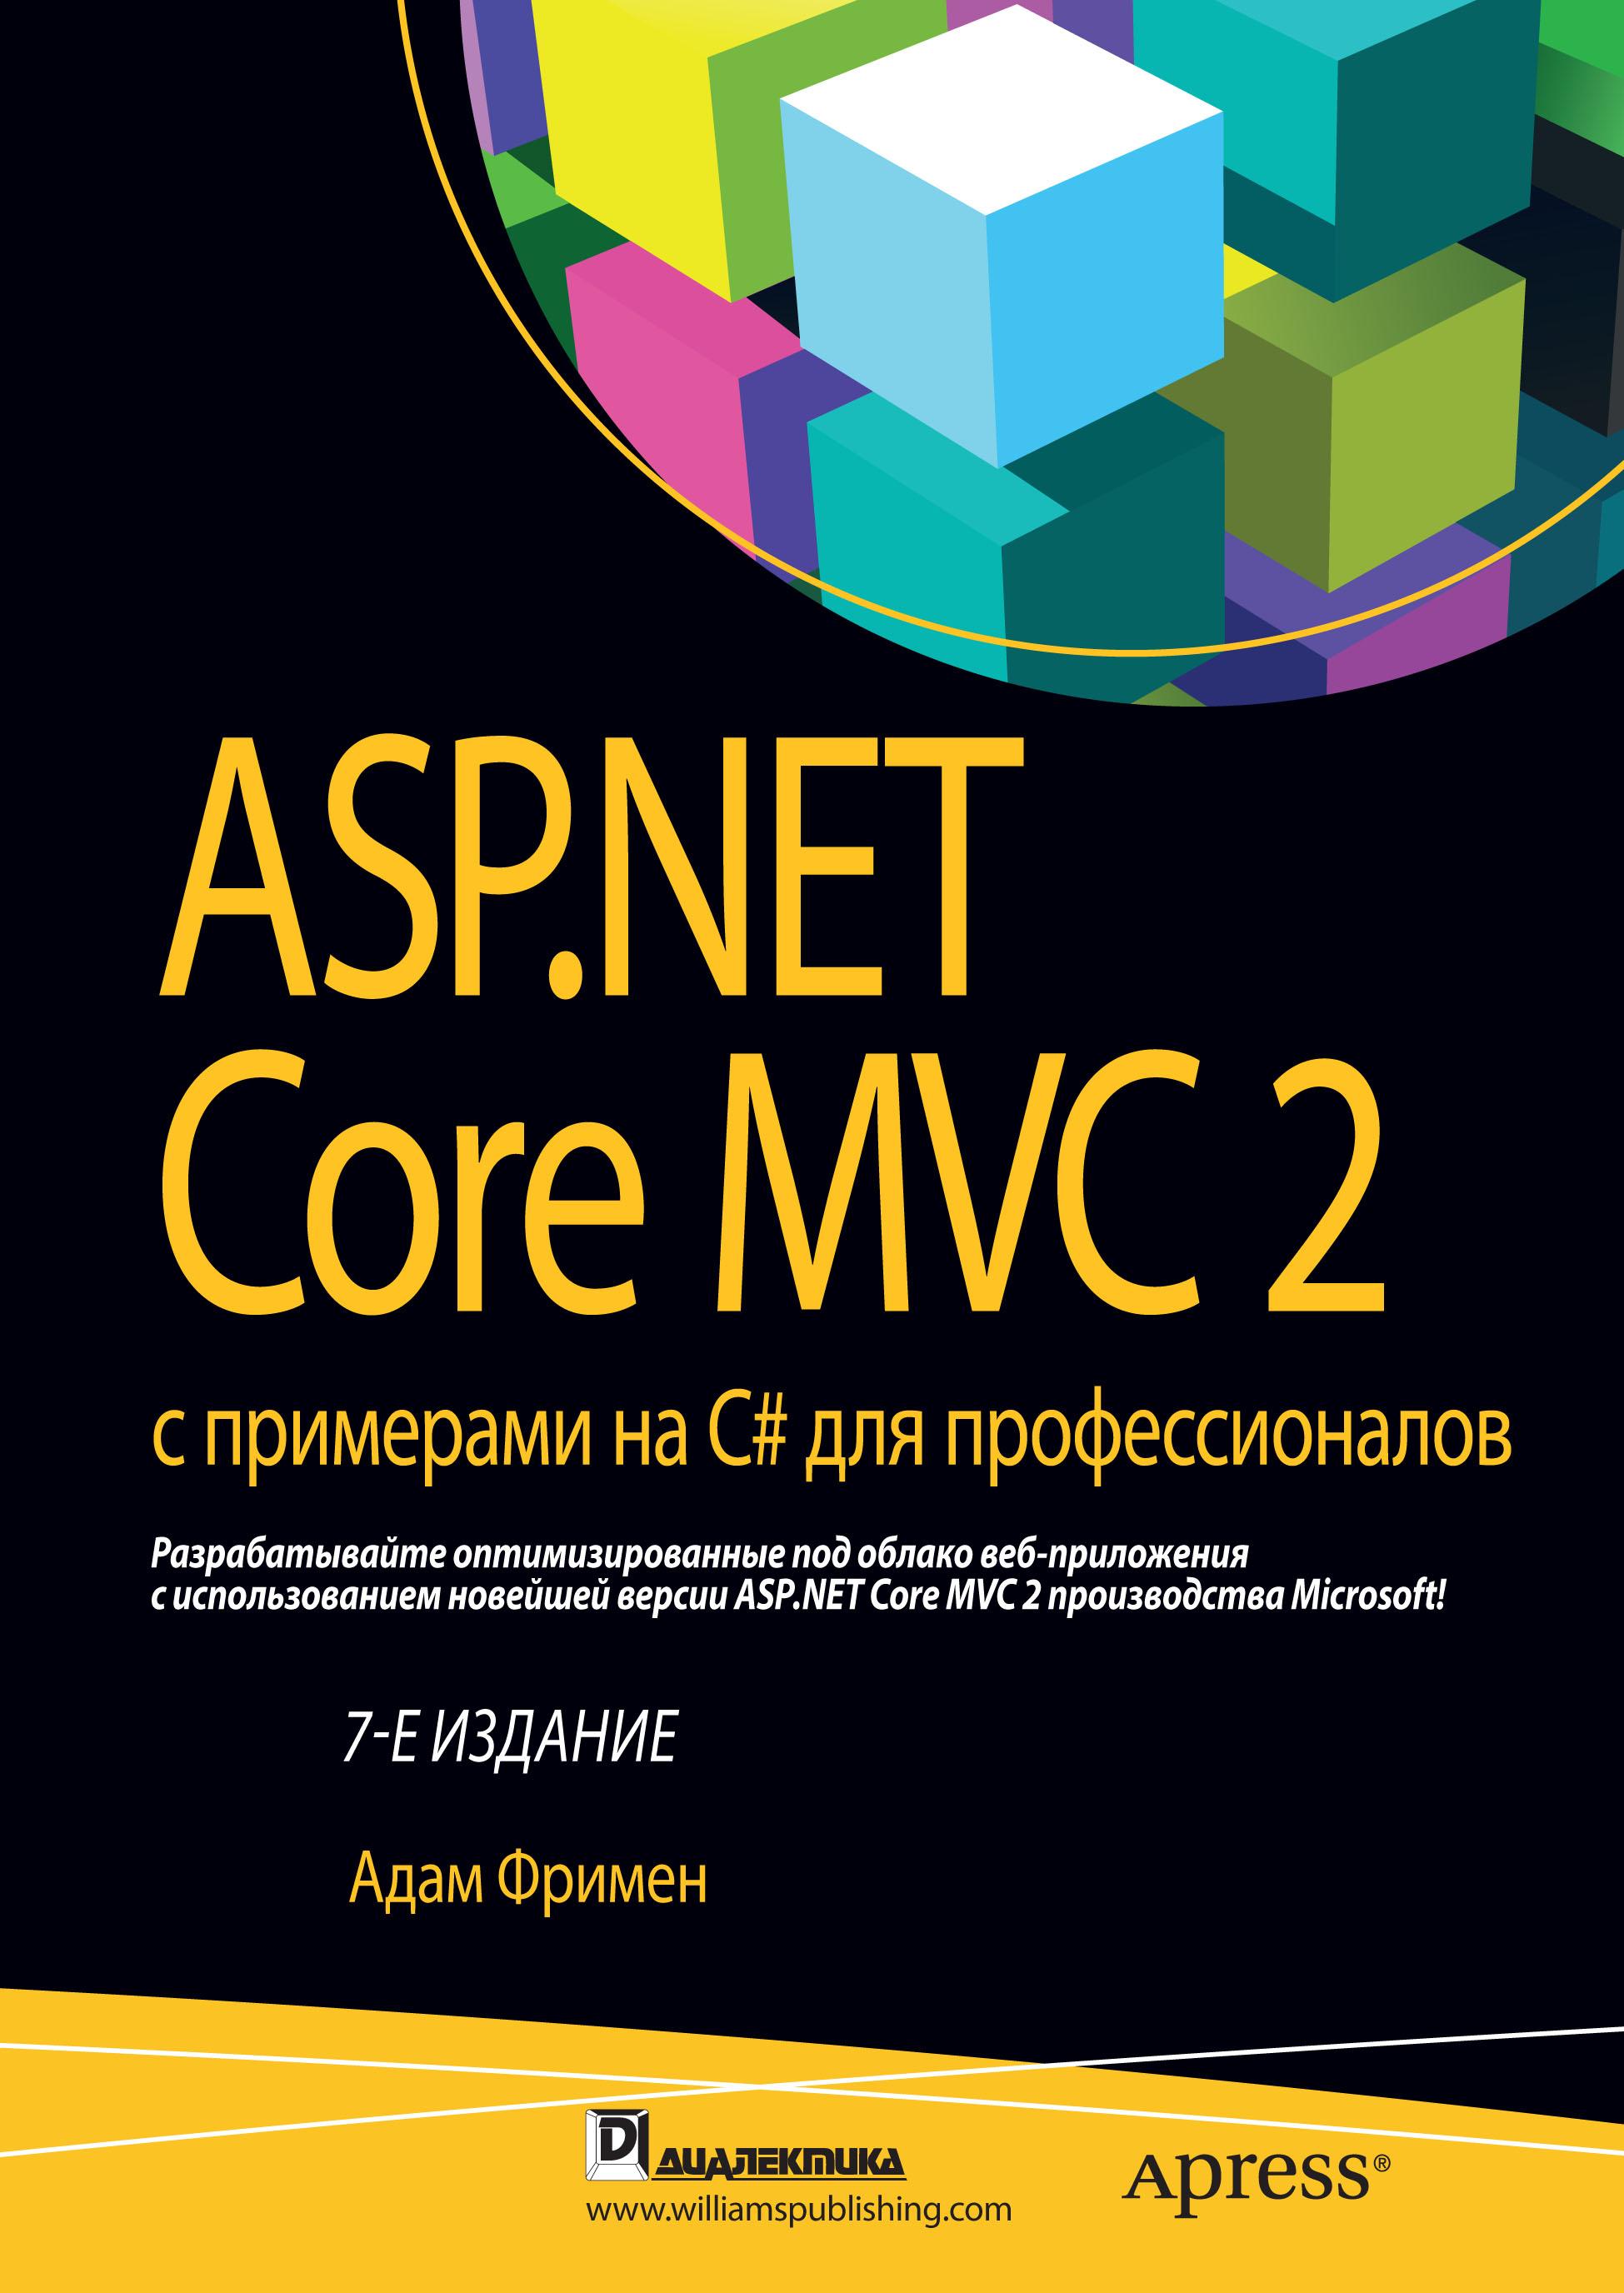 Адам Фримен ASP.NET Core MVC 2 с примерами на C# для профессионалов цена